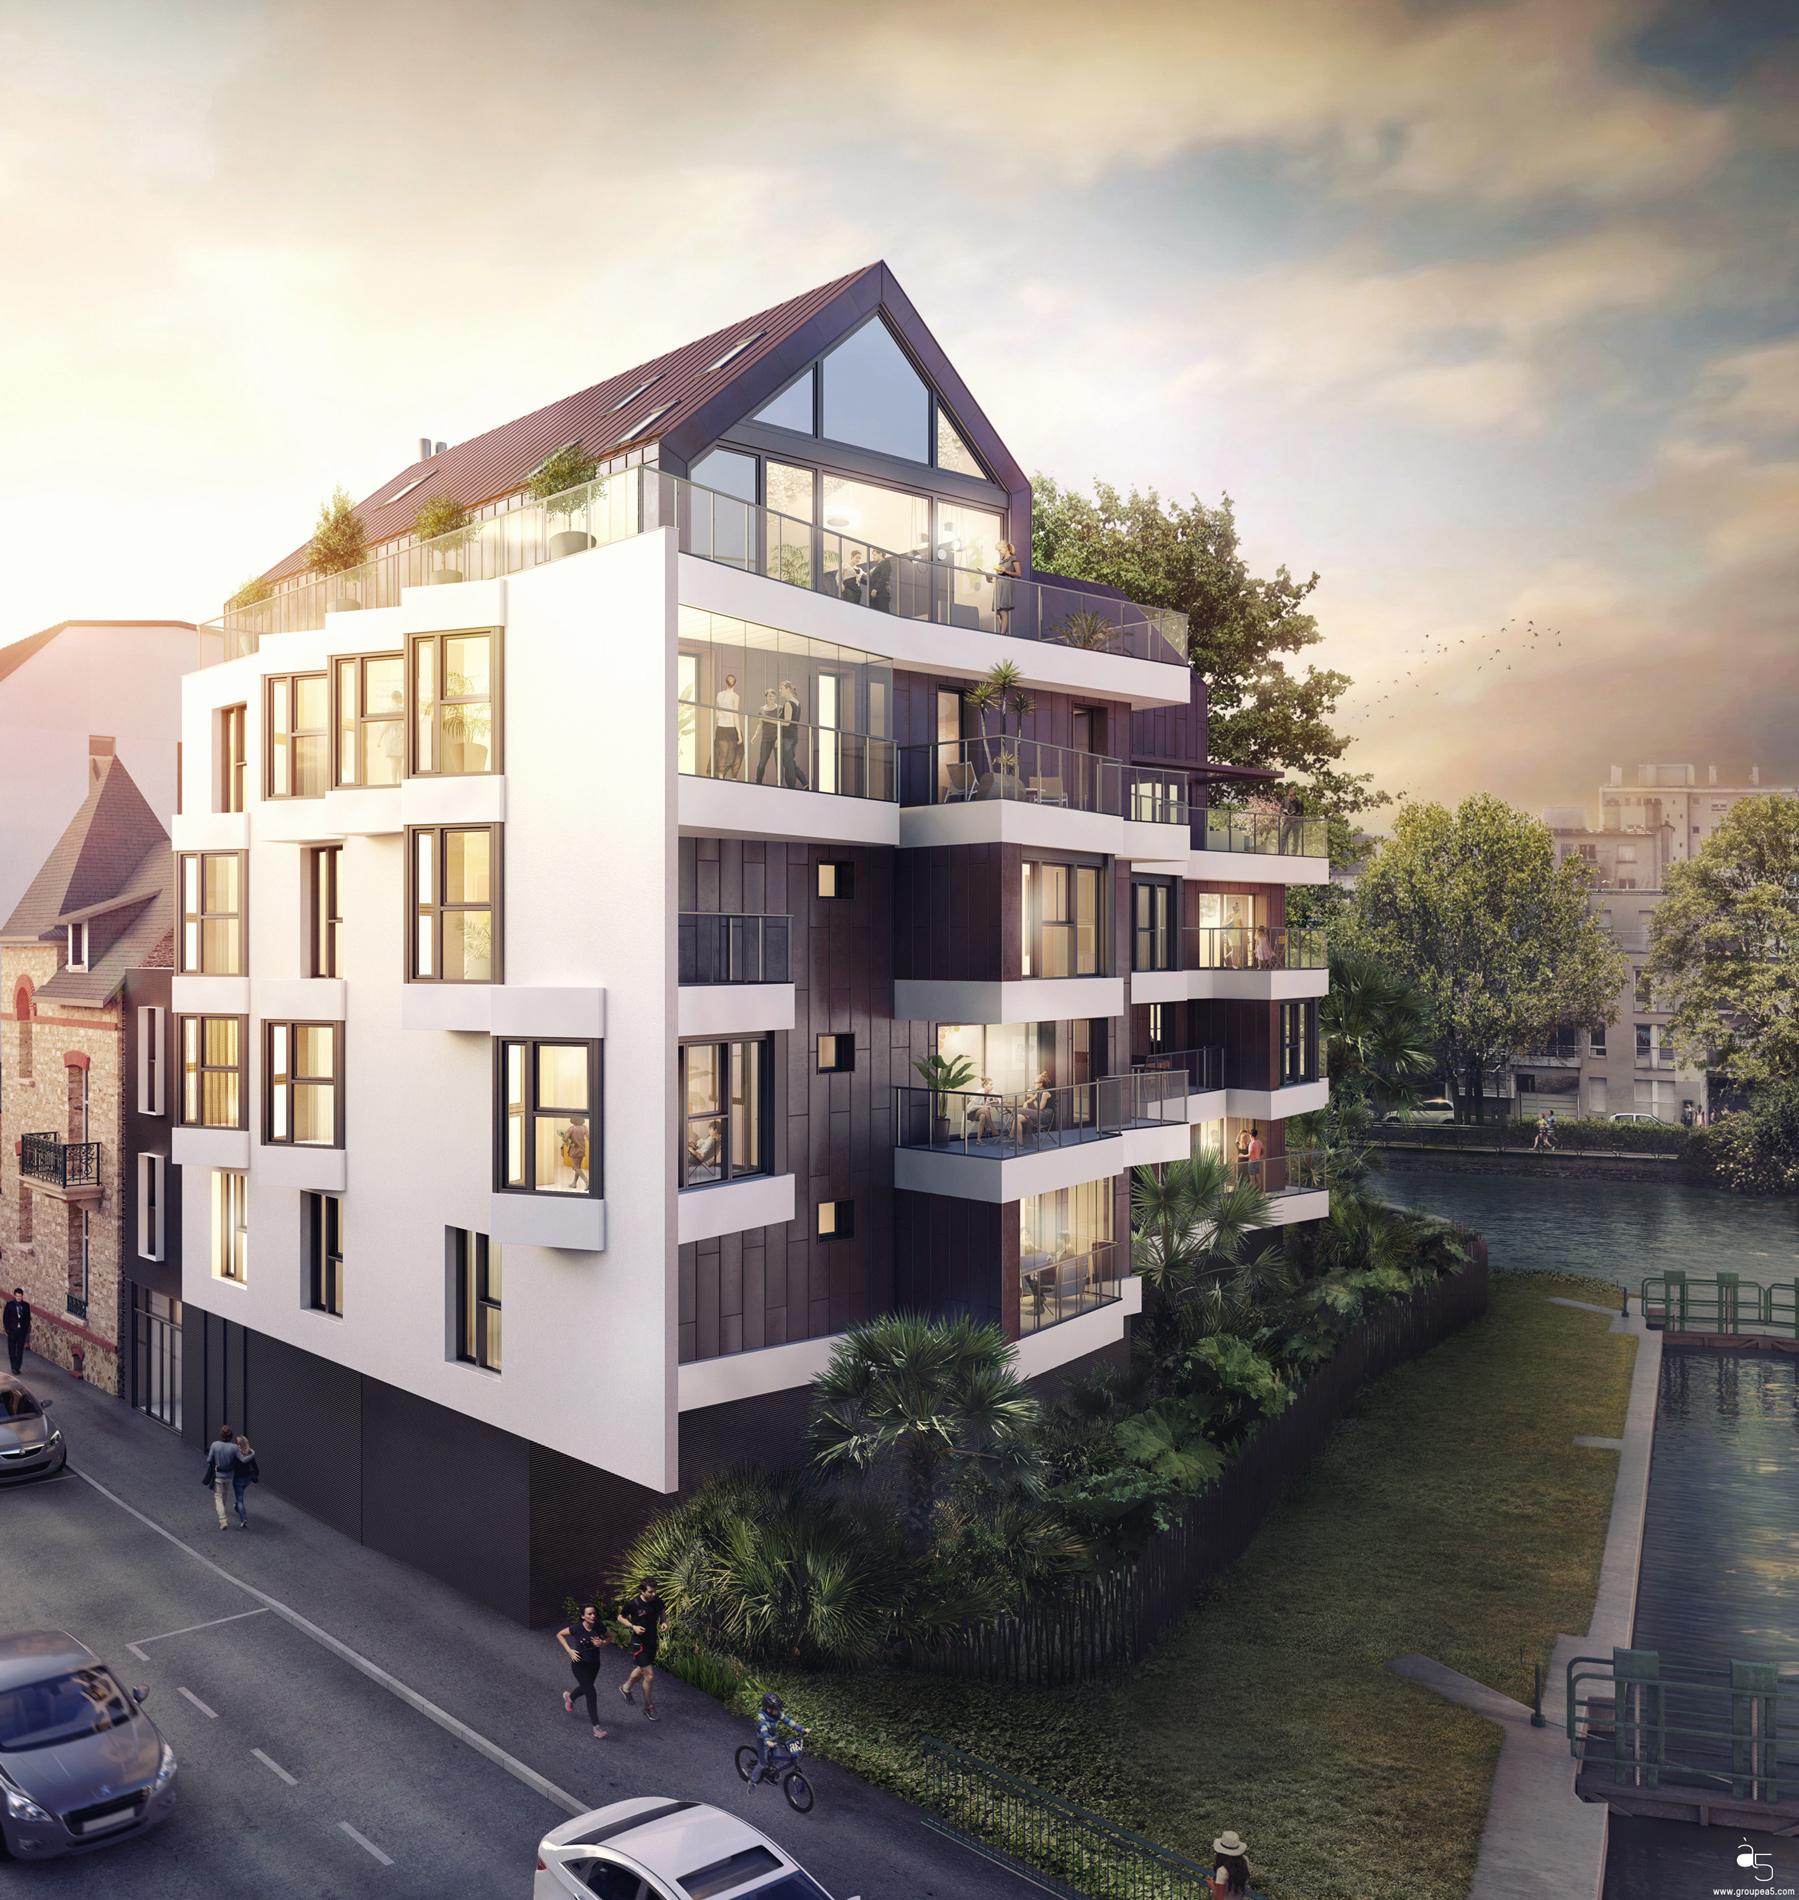 residence-lapalmeraie-rennes-ocdl-giboire-golhen